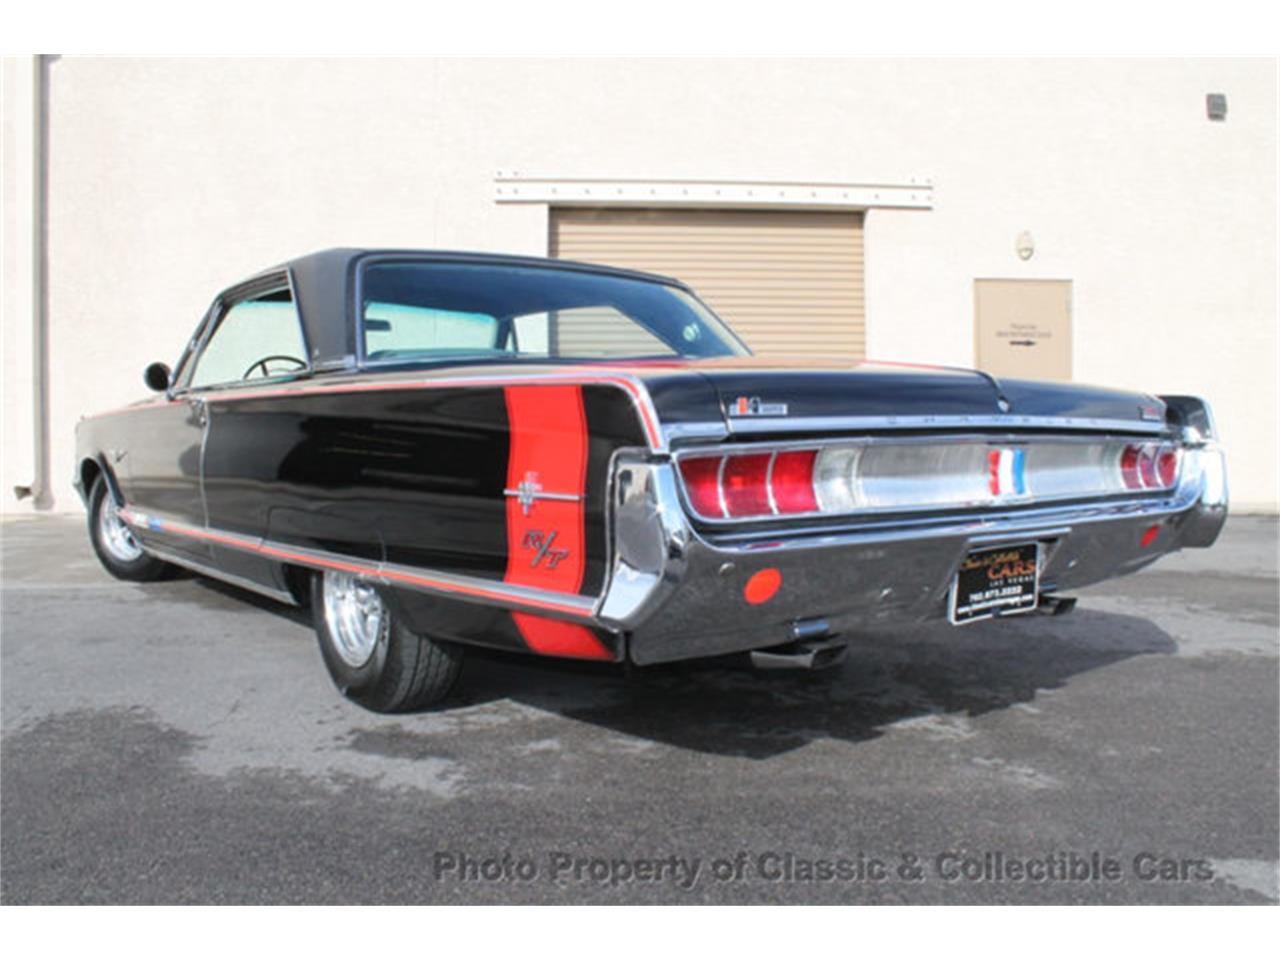 1965 Chrysler 300 (CC-1200688) for sale in Las Vegas, Nevada